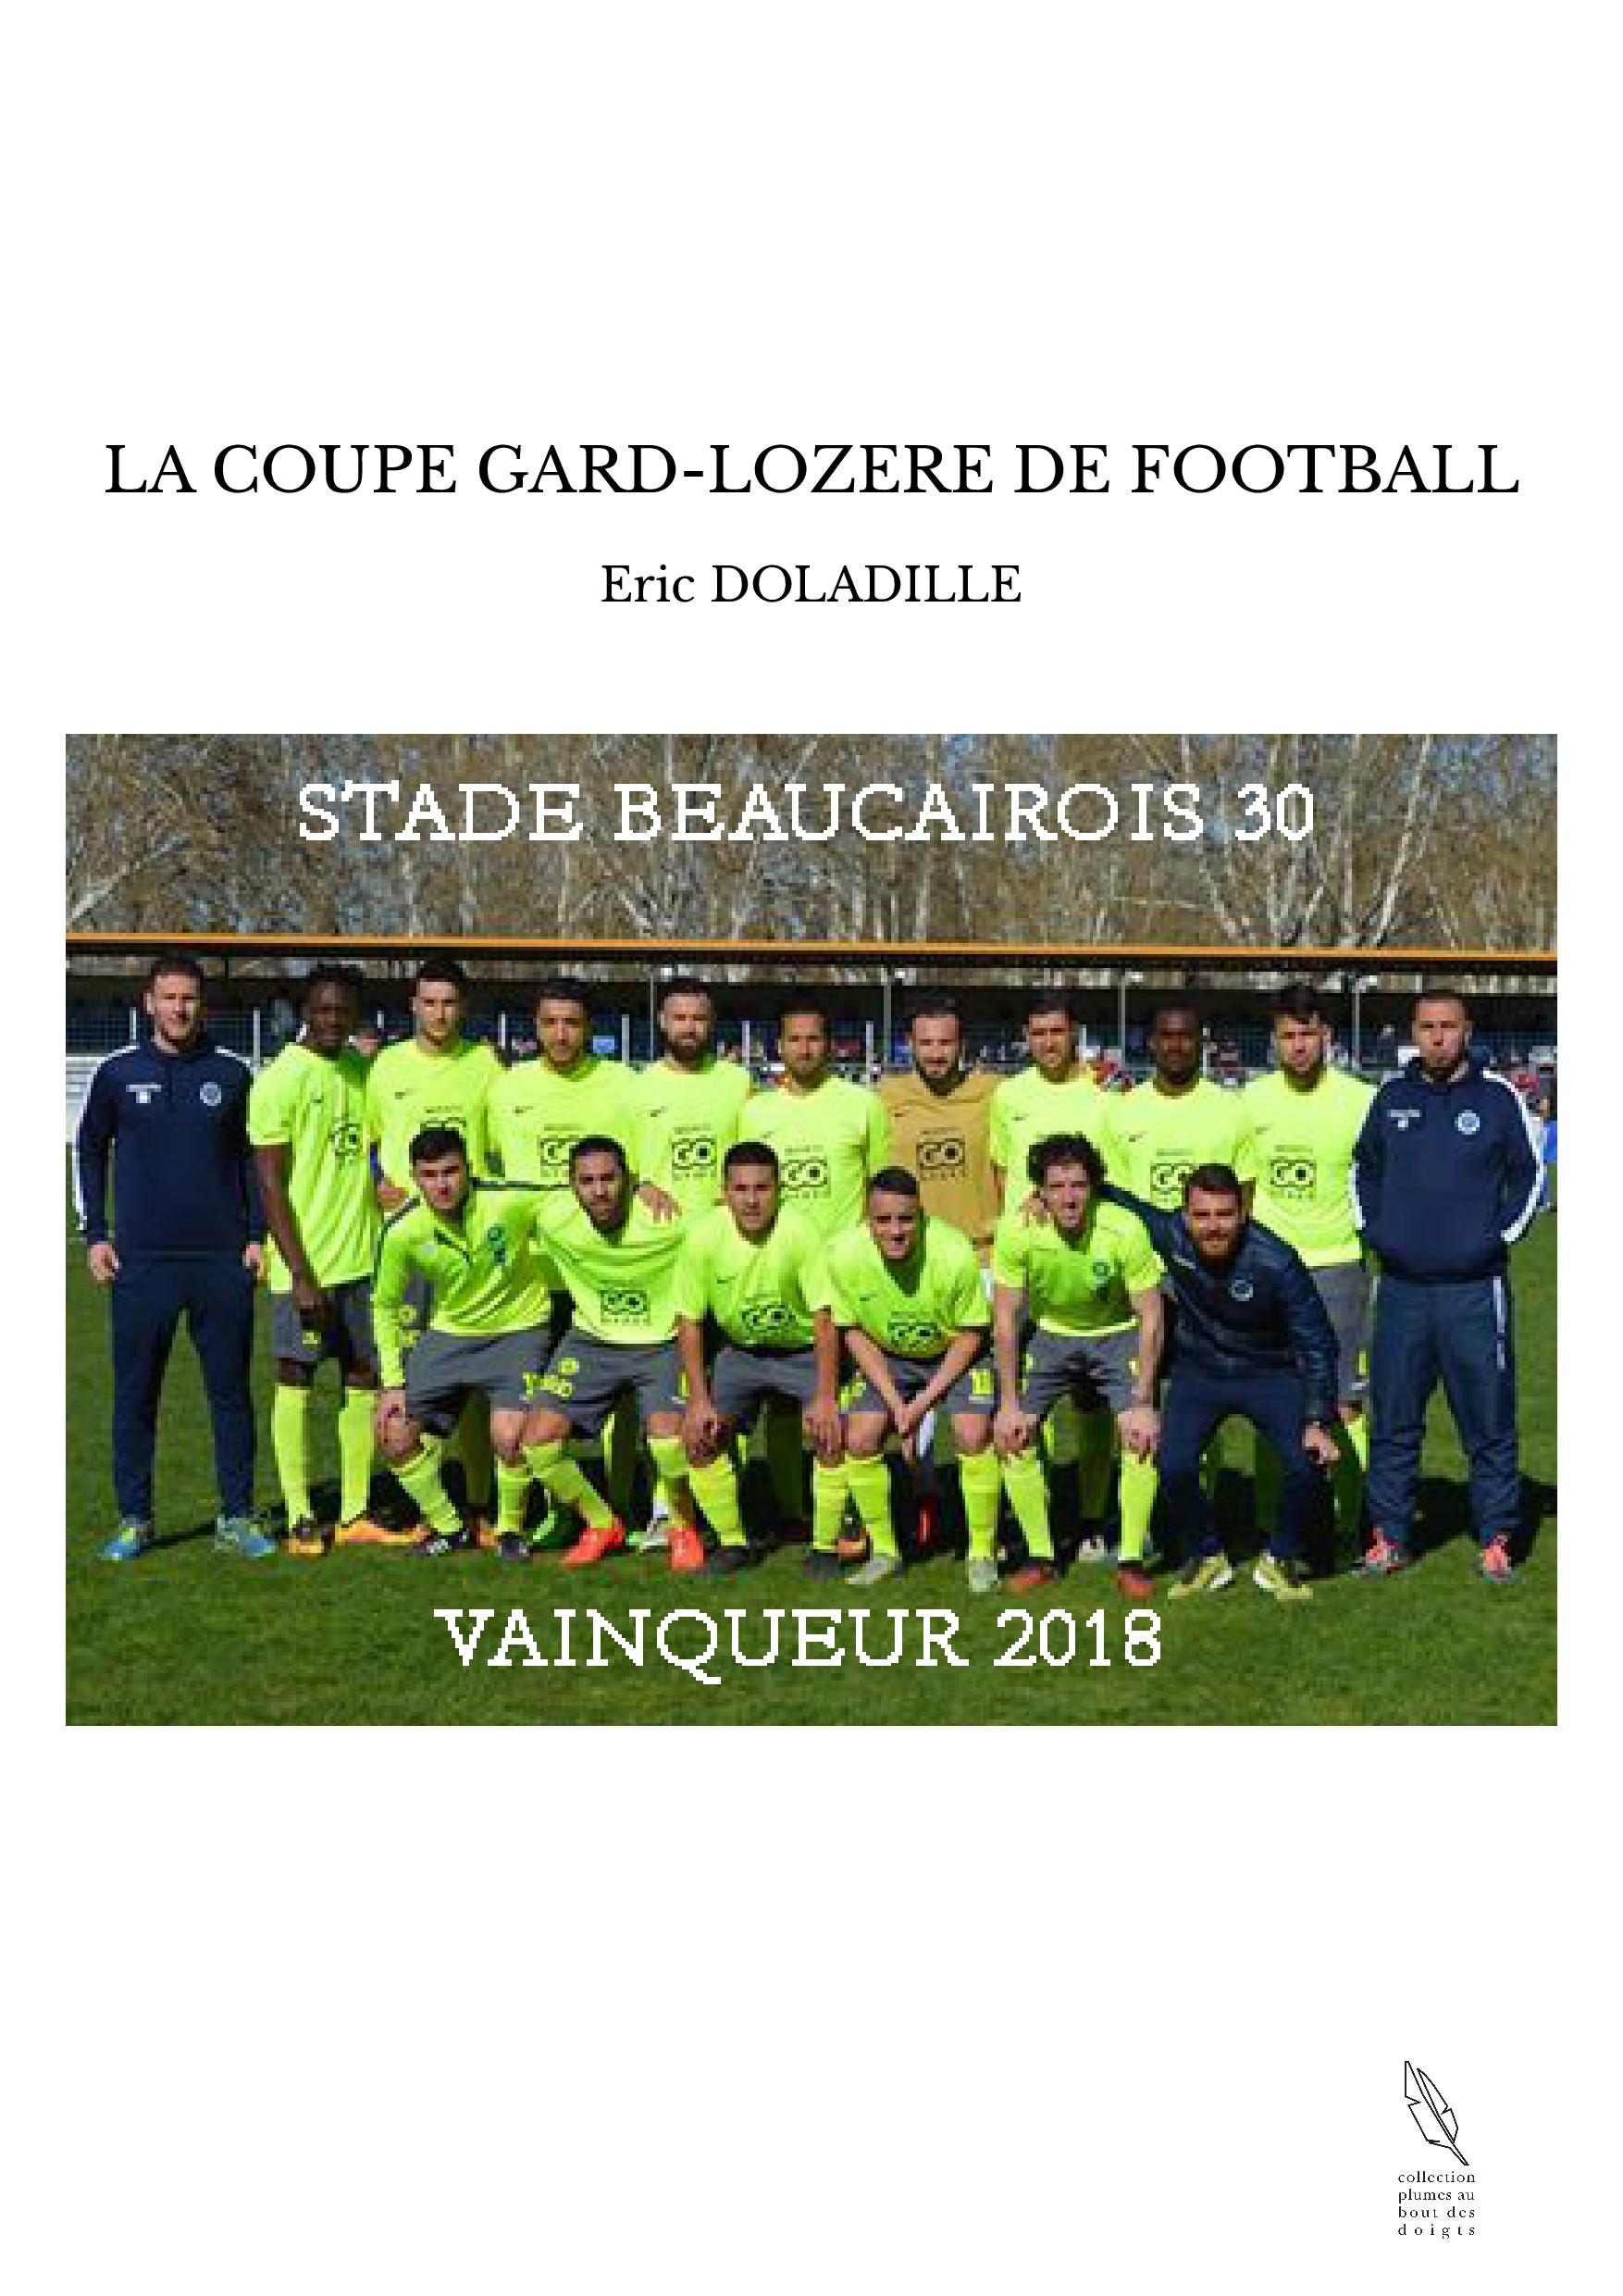 LA COUPE GARD-LOZERE DE FOOTBALL